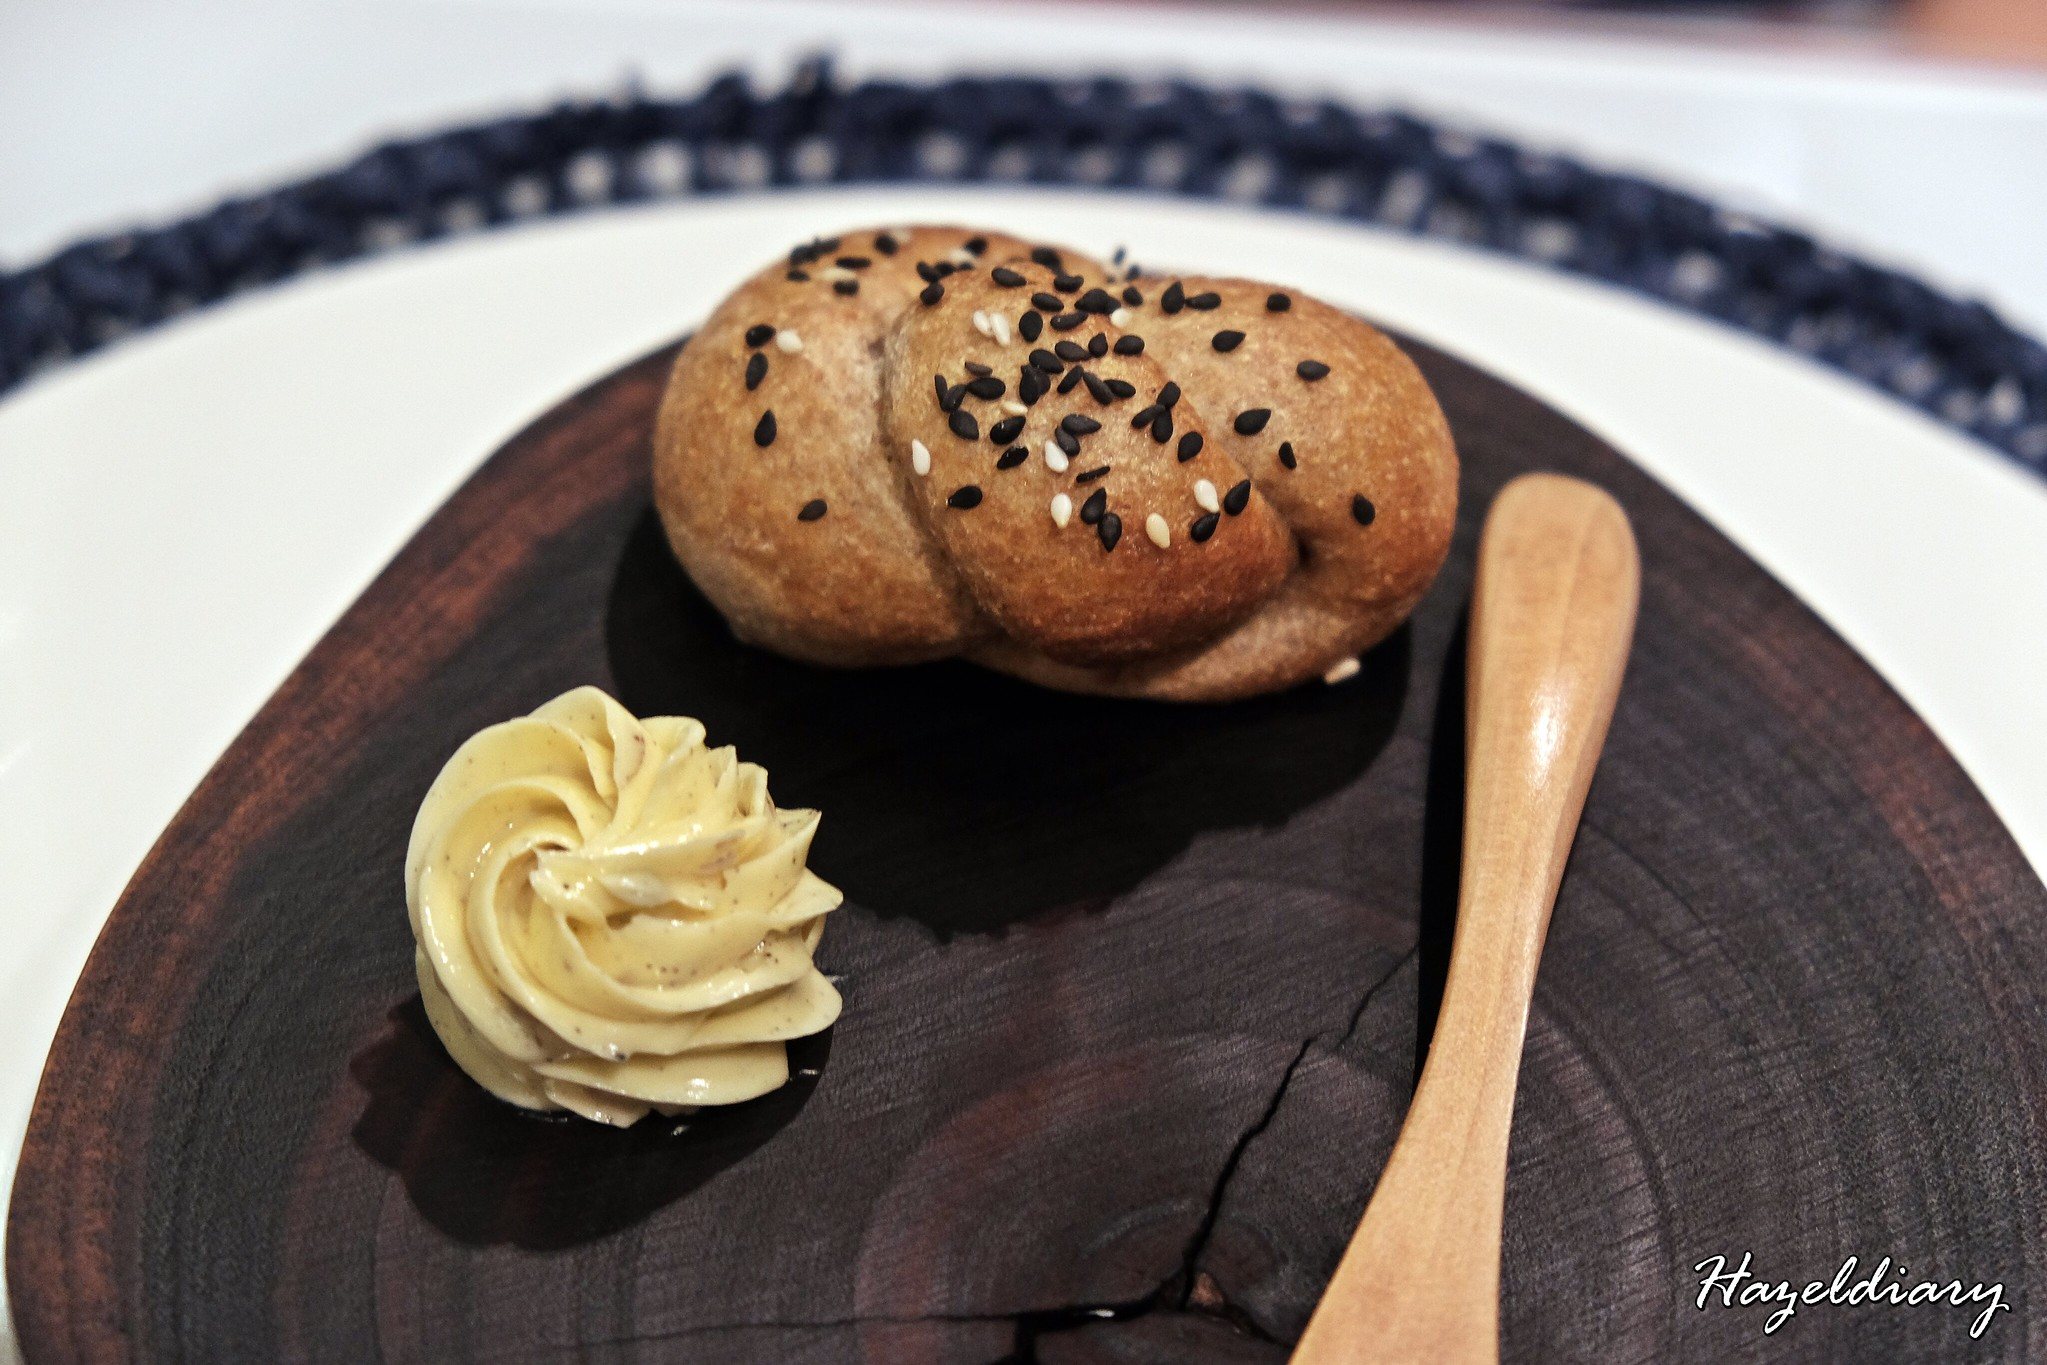 Subrosa Private Dining-Artisanal Bread